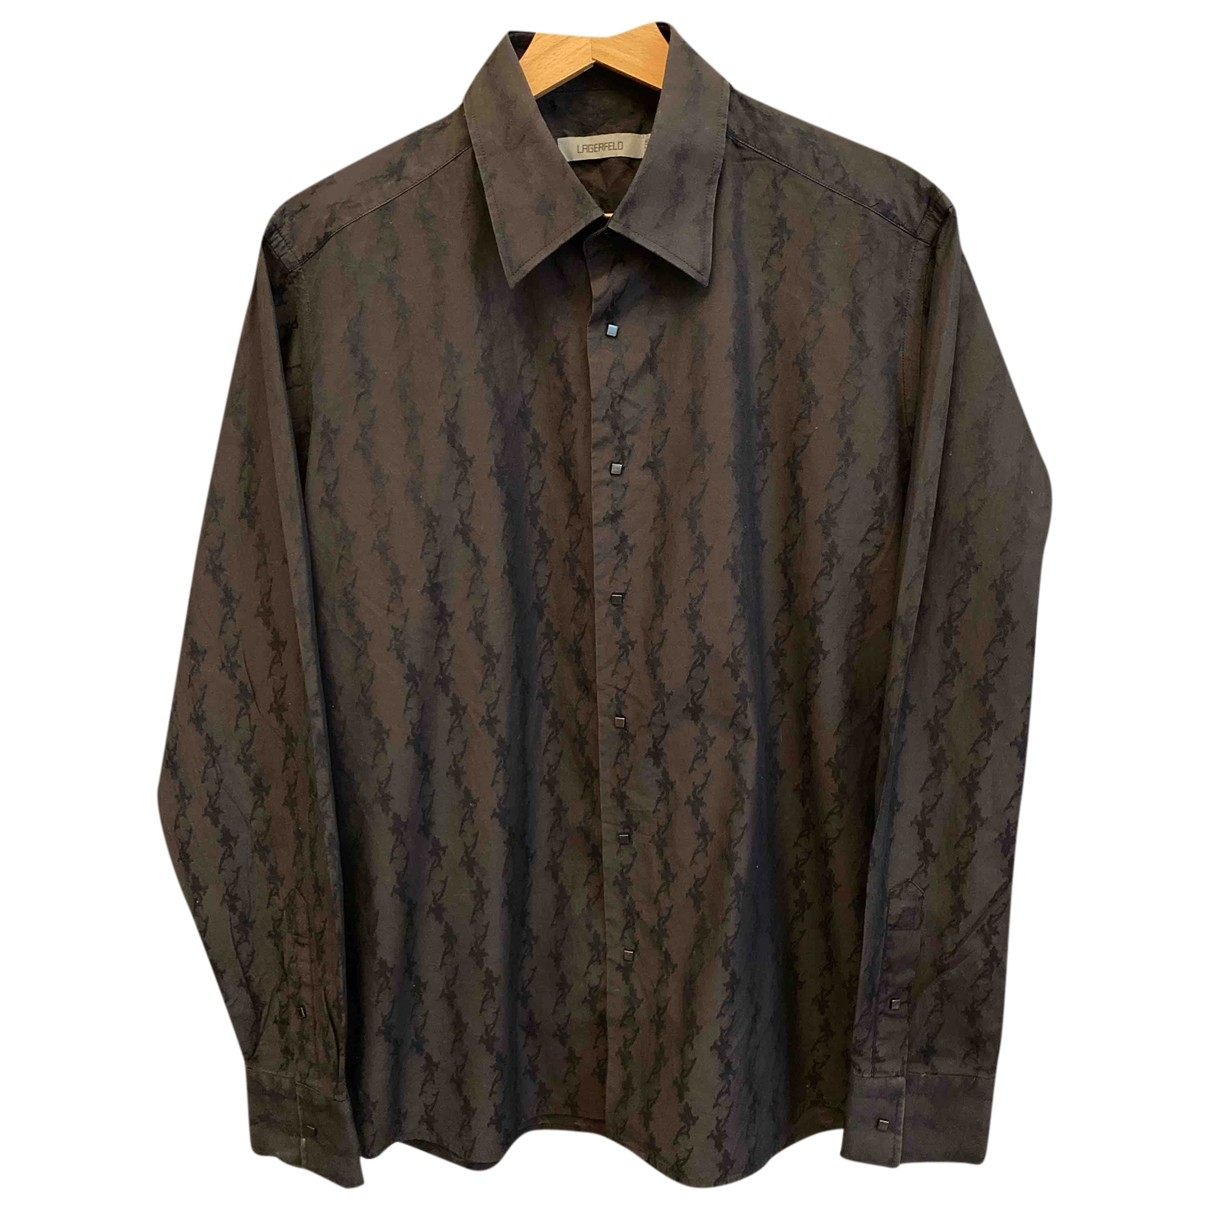 Karl Lagerfeld \N Cotton Shirts for Men 40 EU (tour de cou / collar)